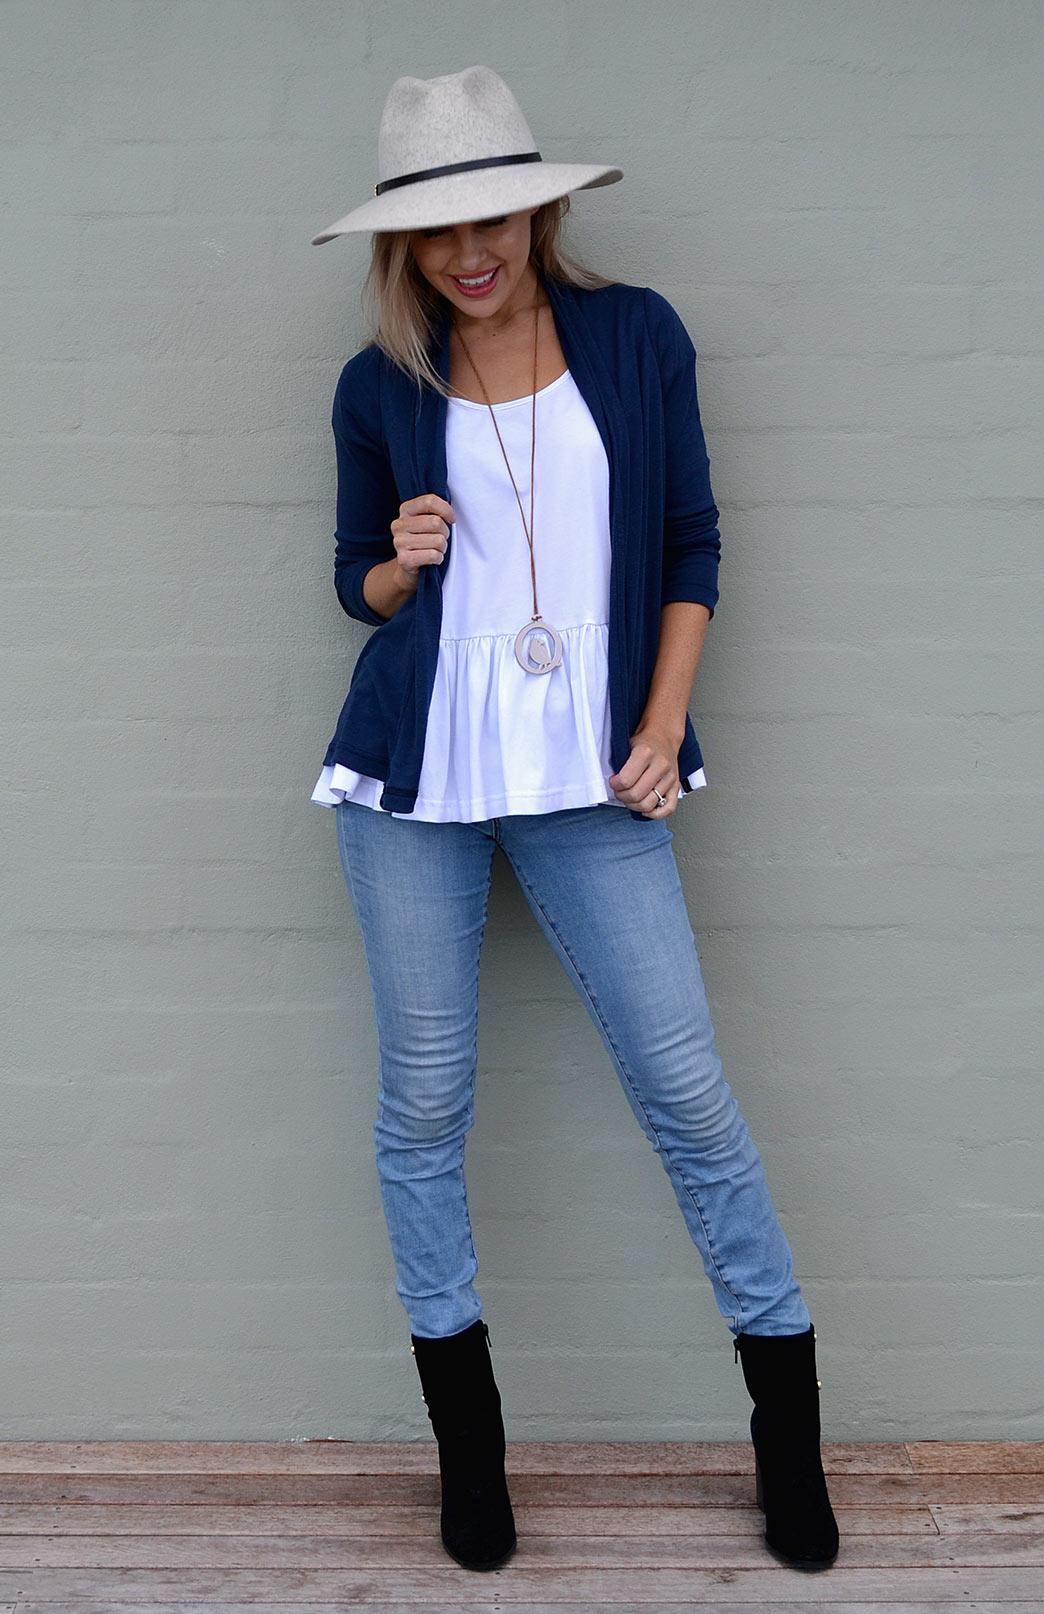 Mini Drape Cardigan - Women's Dark Indigo Blue Long Sleeve Merino Wool Cardigan - Smitten Merino Tasmania Australia